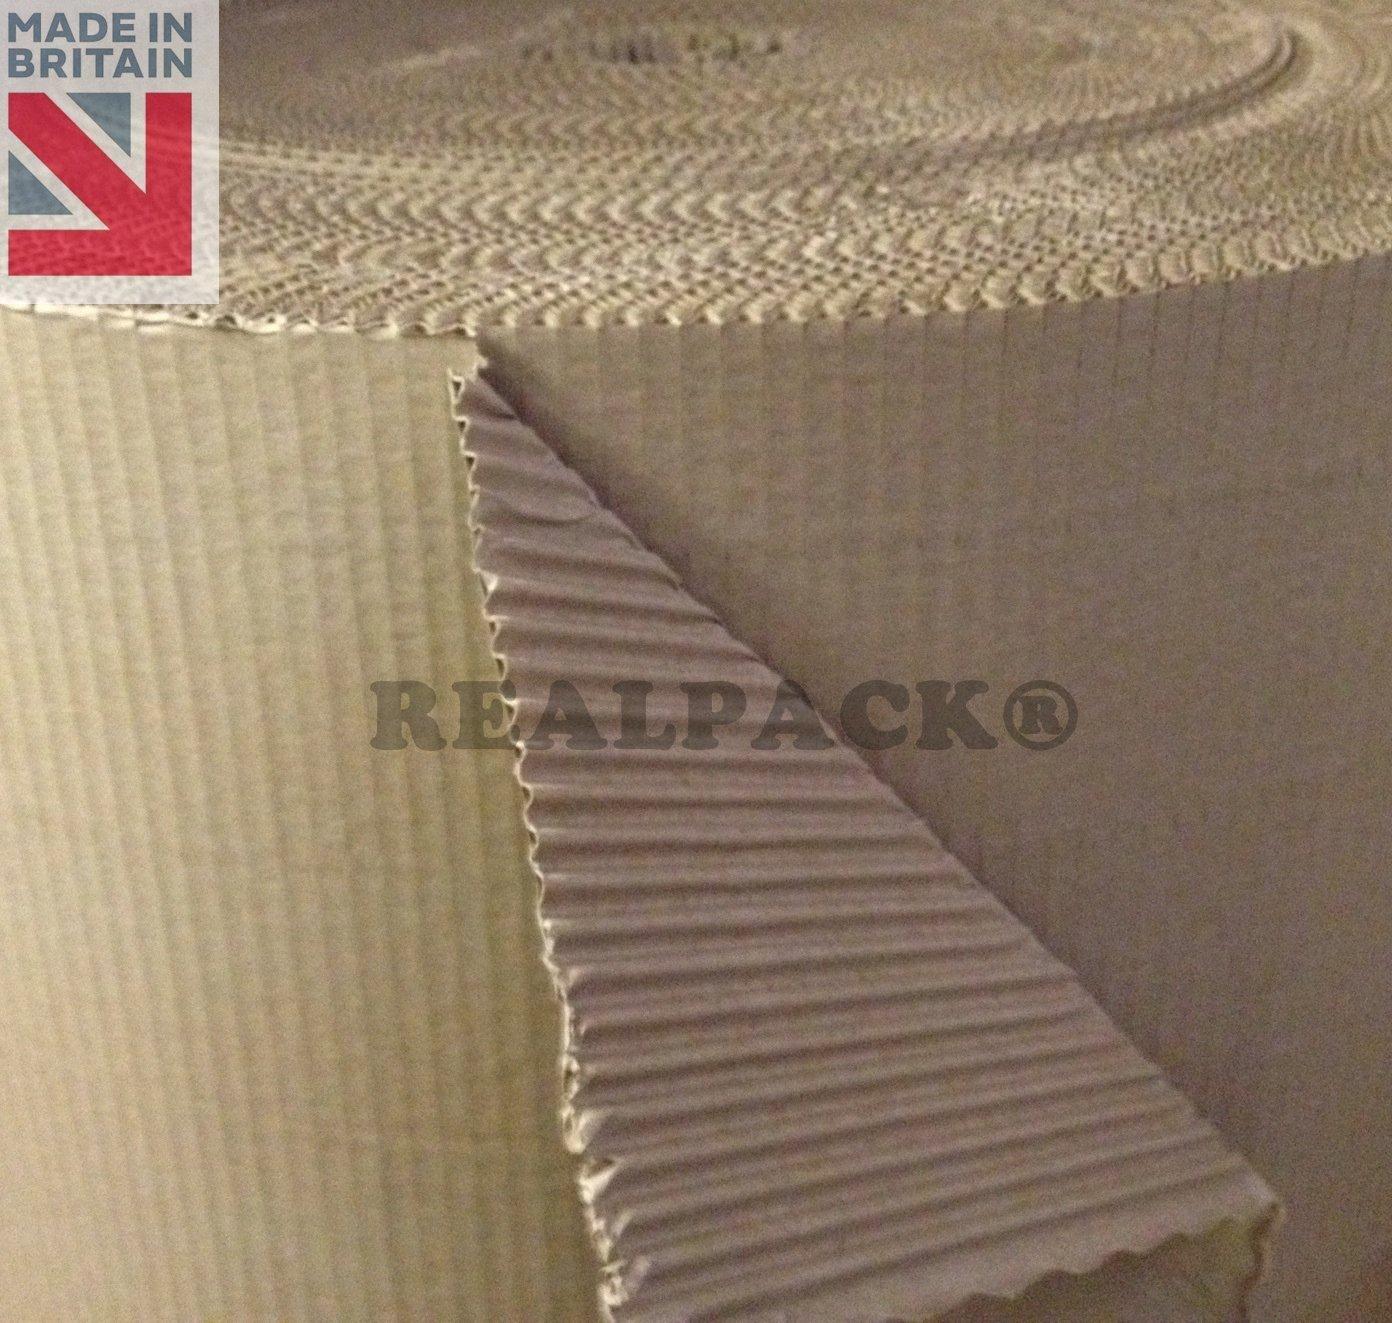 realpack/® Wellpappe Papier Rollen Rollen Papier Craft 30,5/cm 300/mm 25/m Beste Qualit/ät